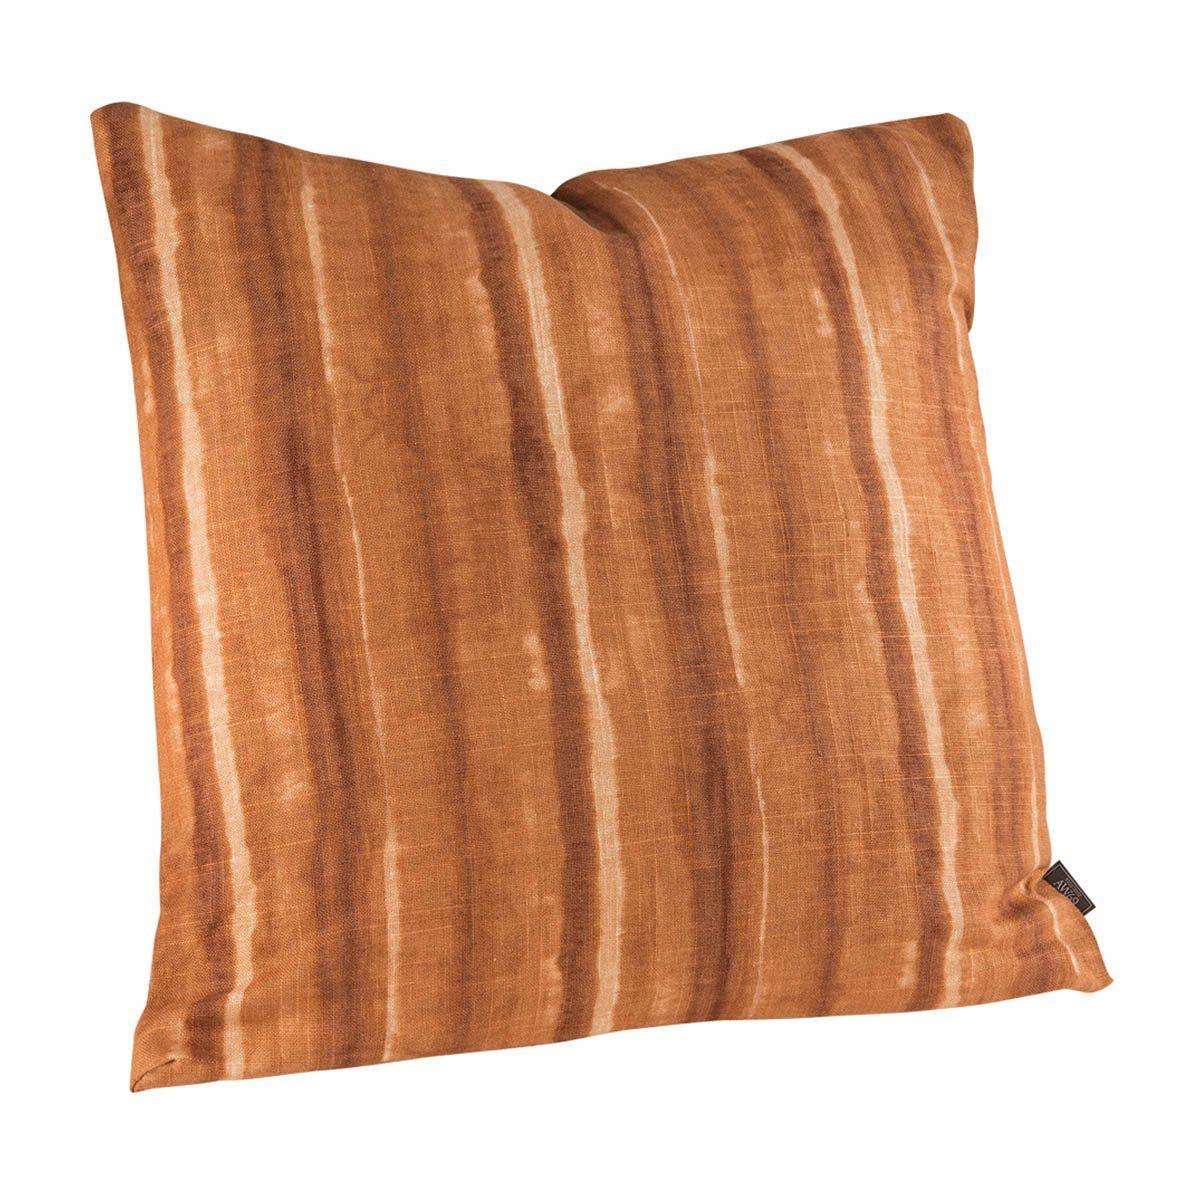 Tulane kuddfodral i storleken 50x50 cm.